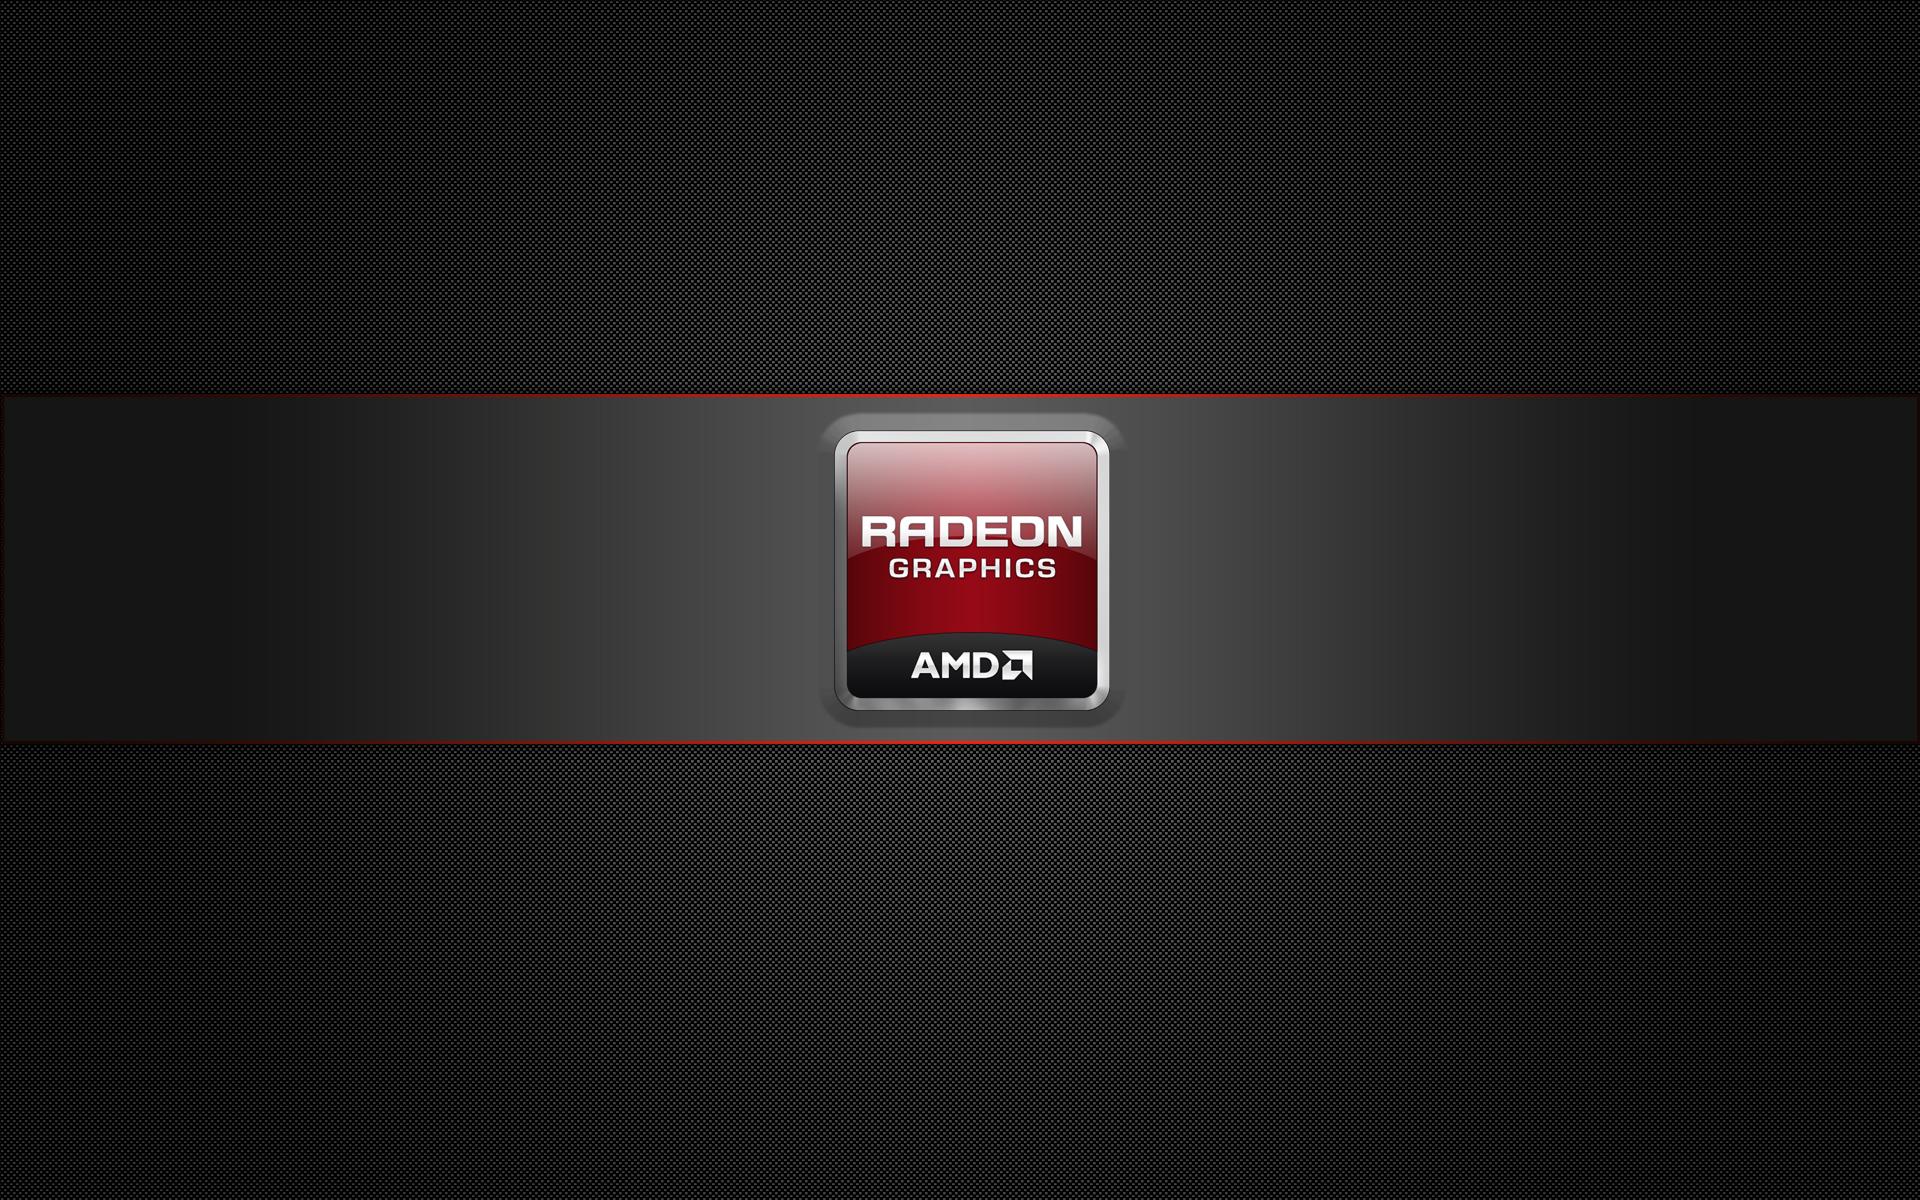 Amd Radeon wallpaper 116285 1920x1200